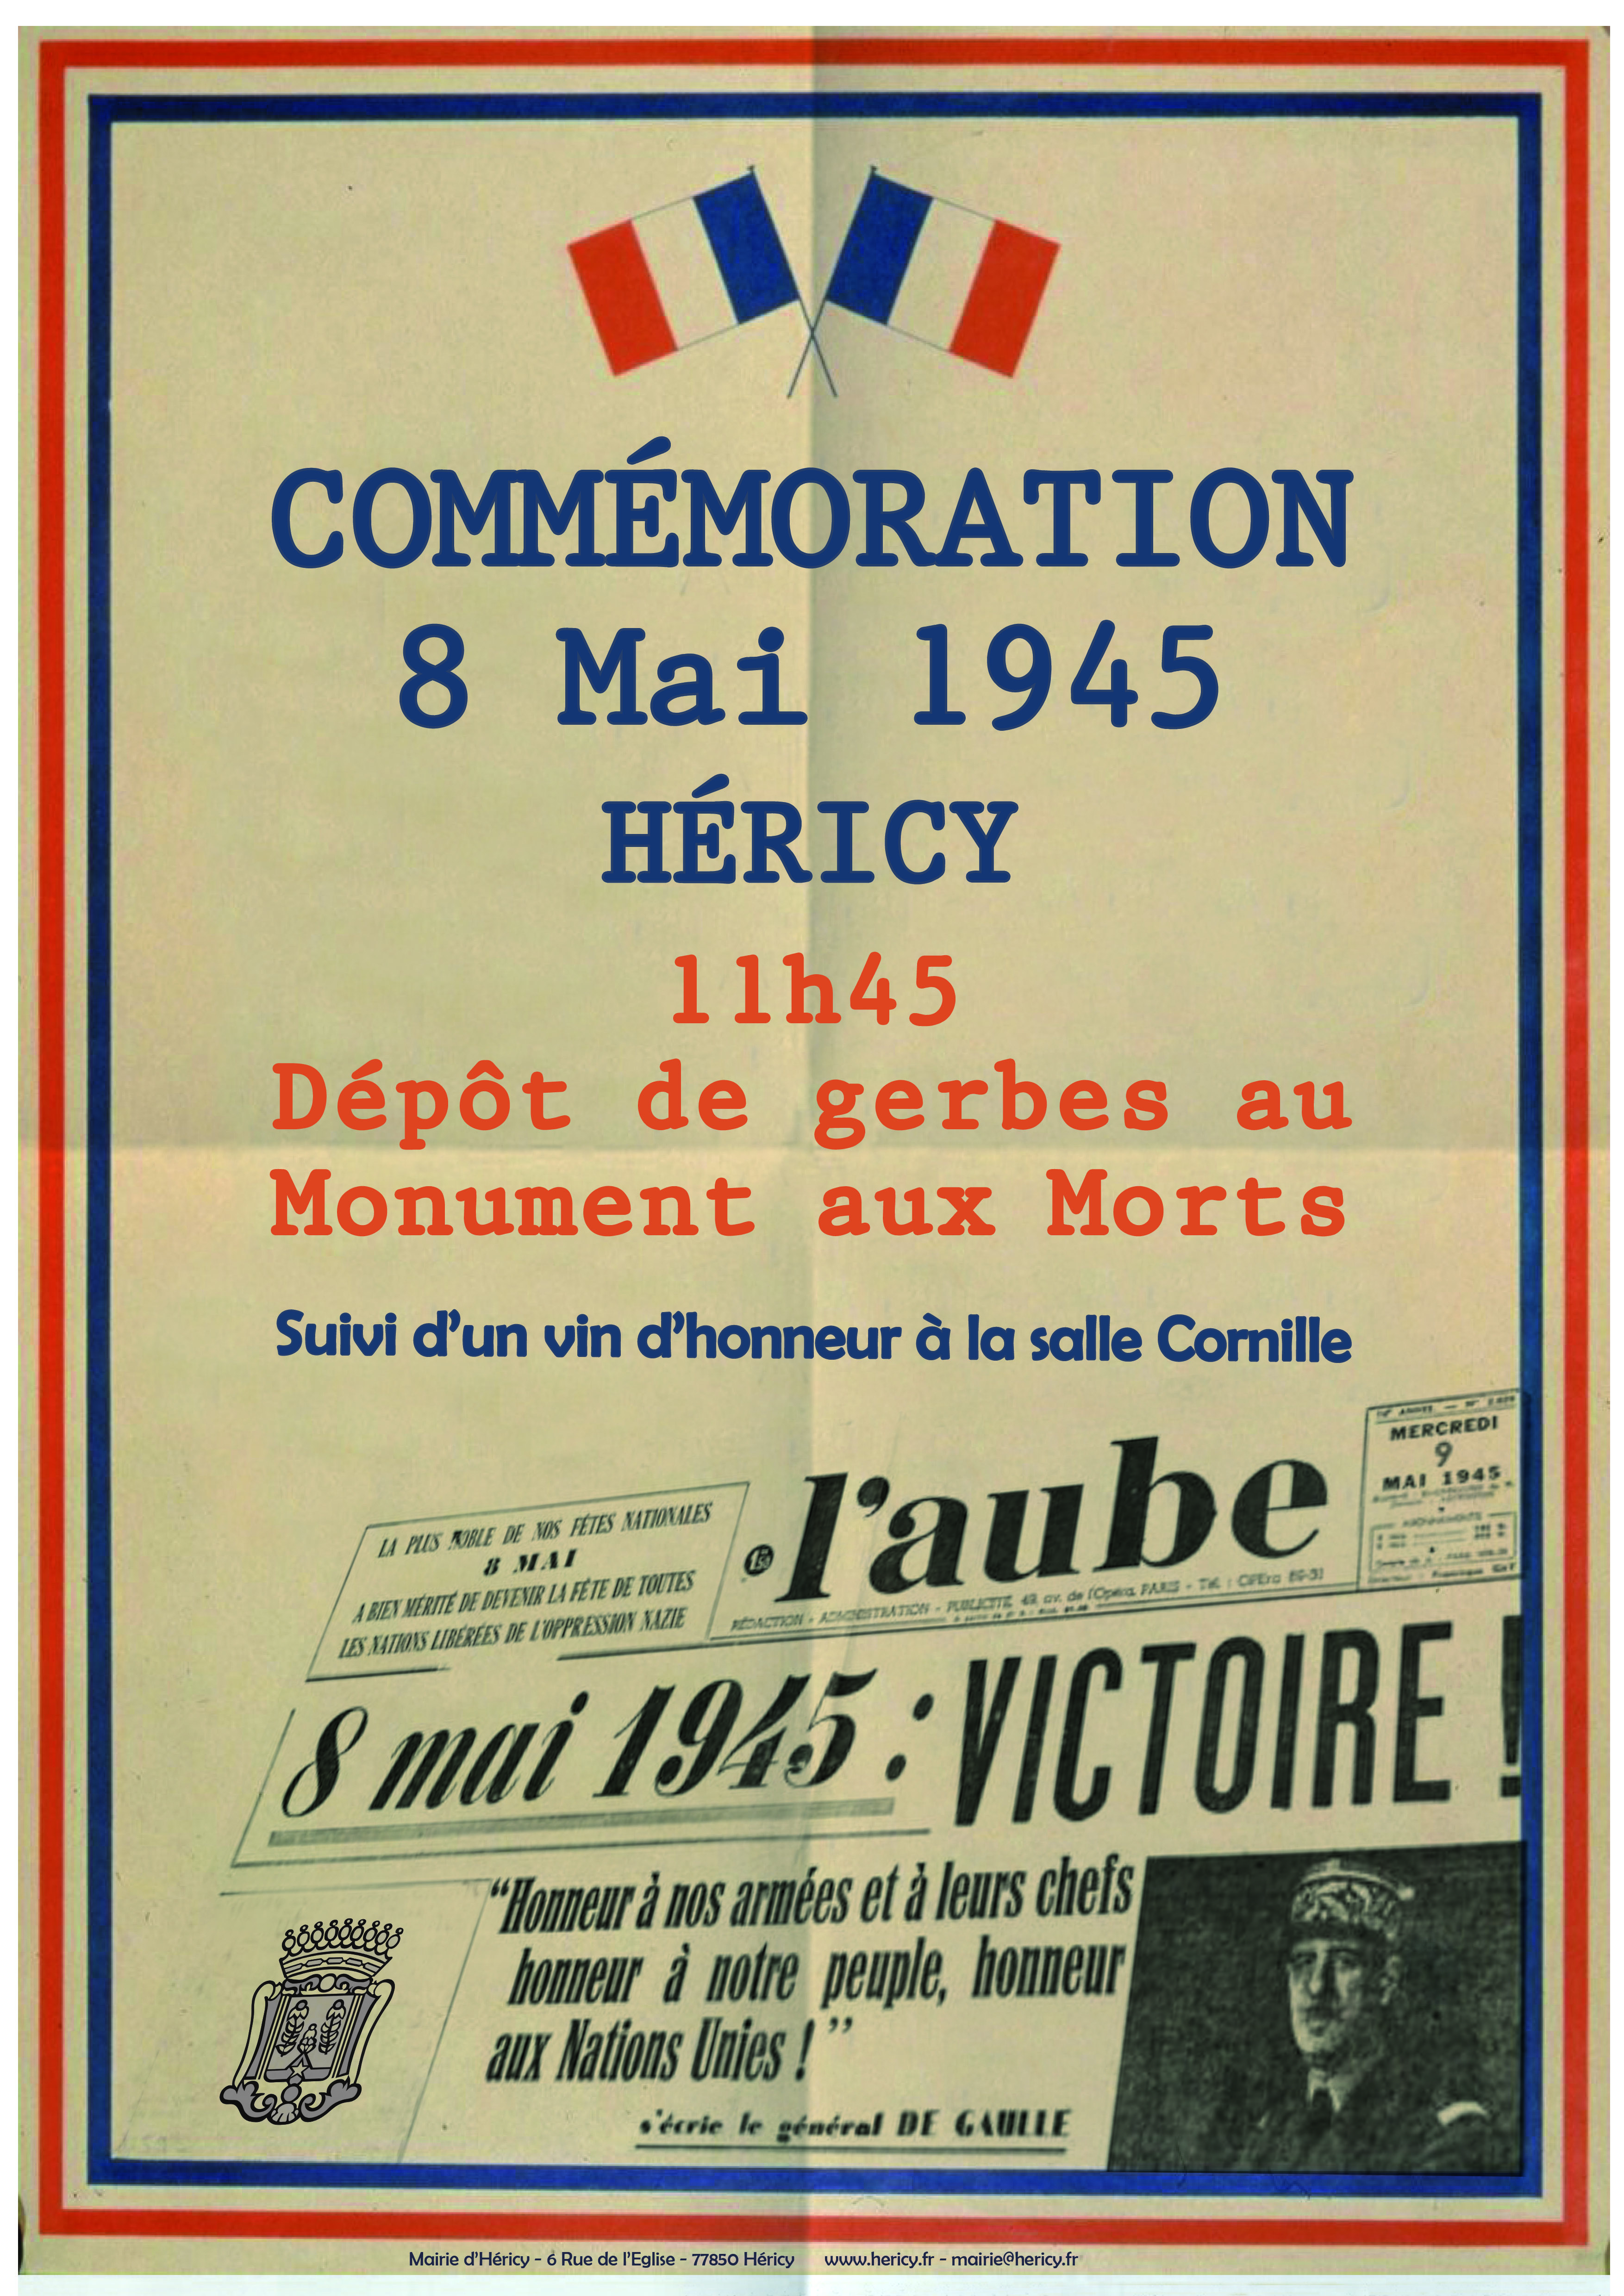 8.Mai 1945